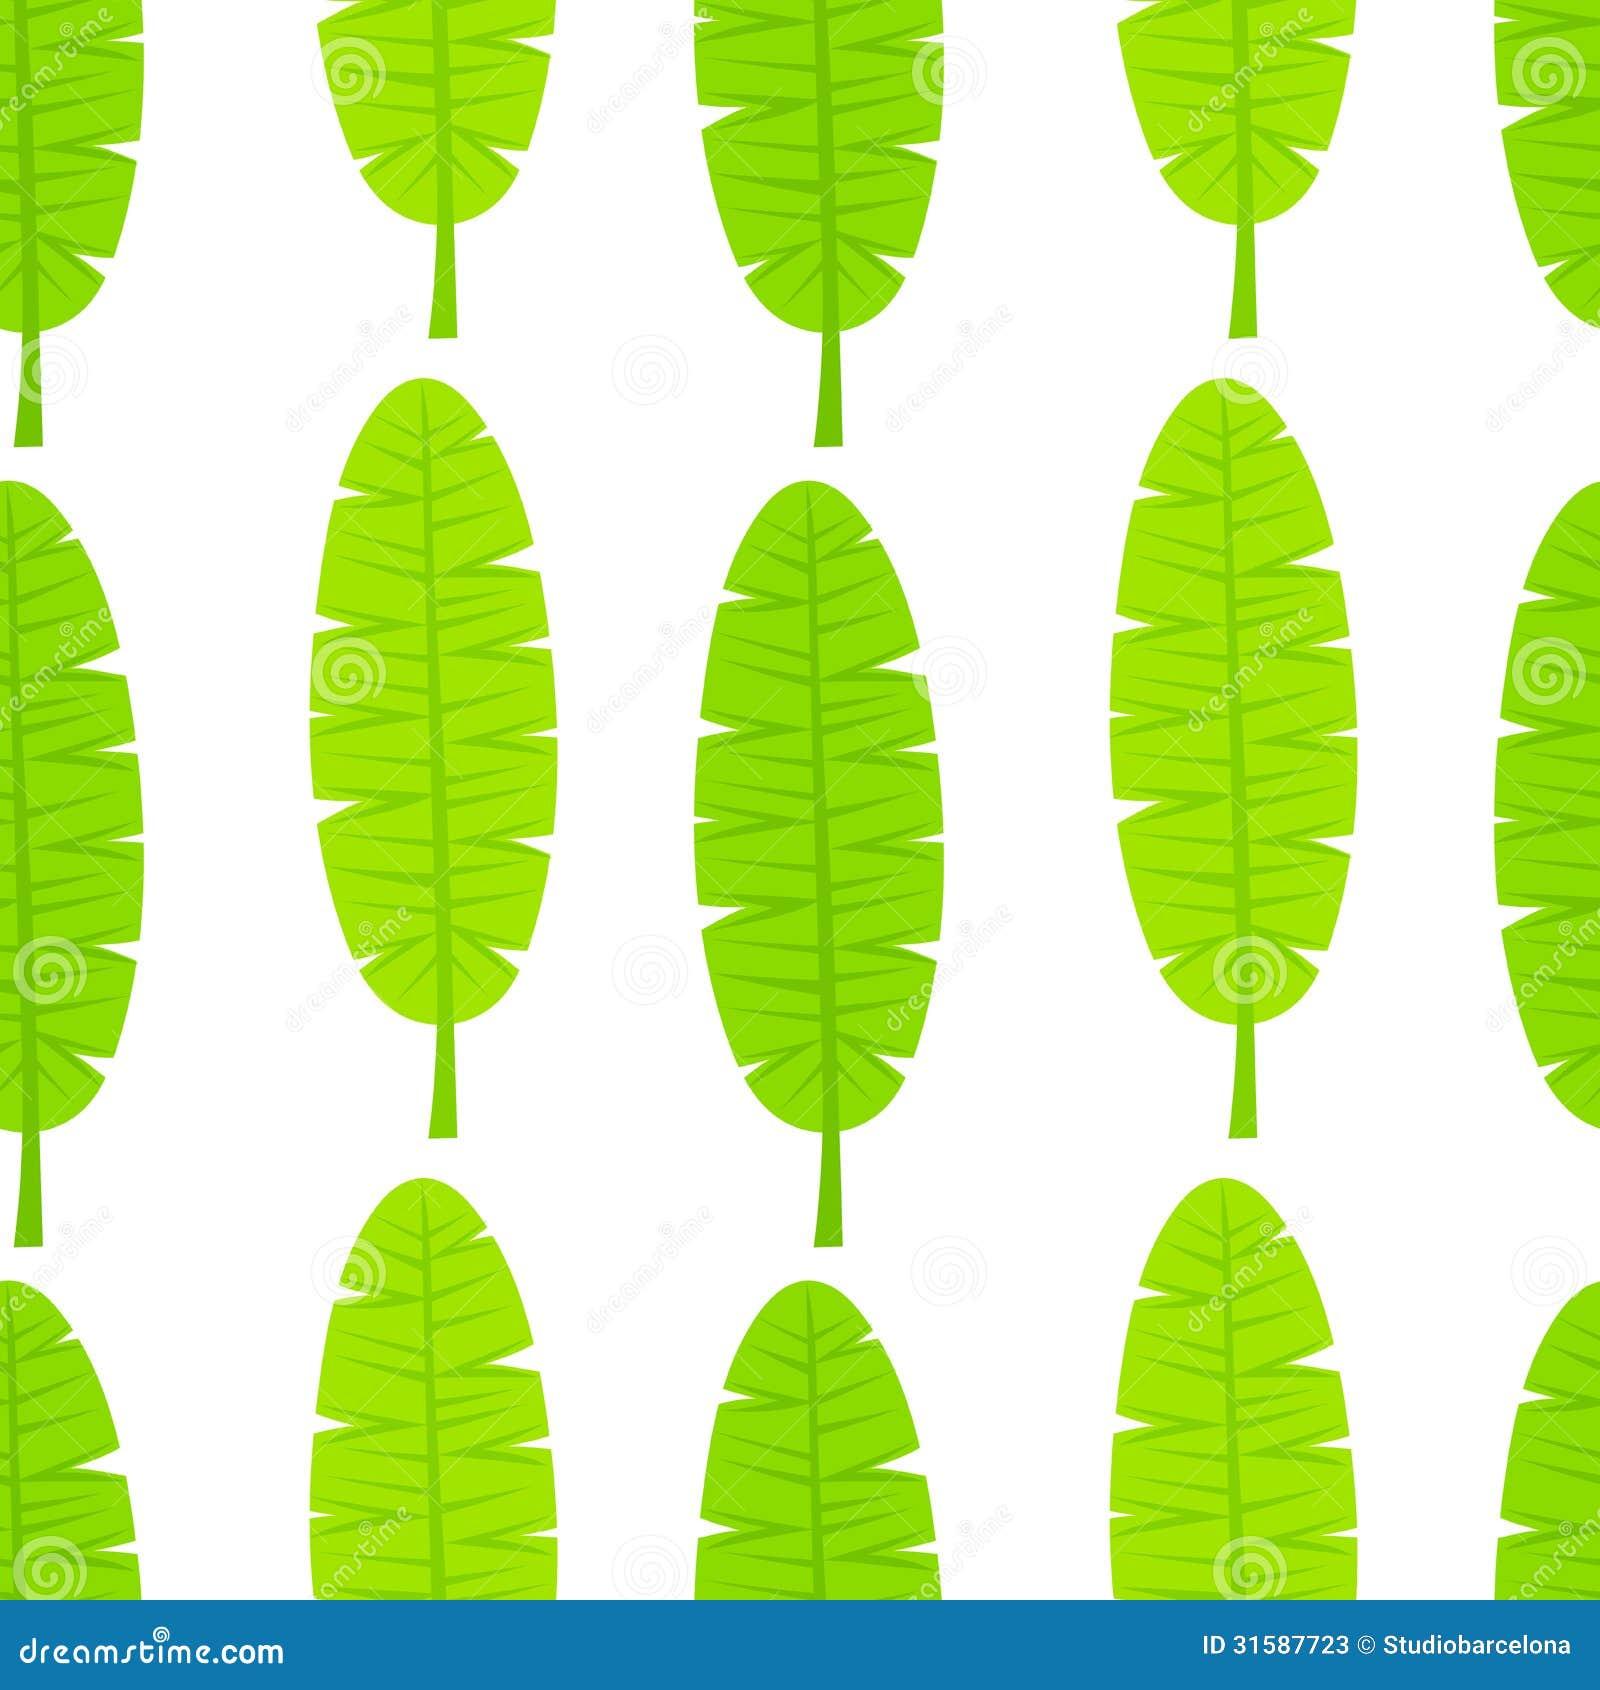 banana tree leaves vector - photo #21